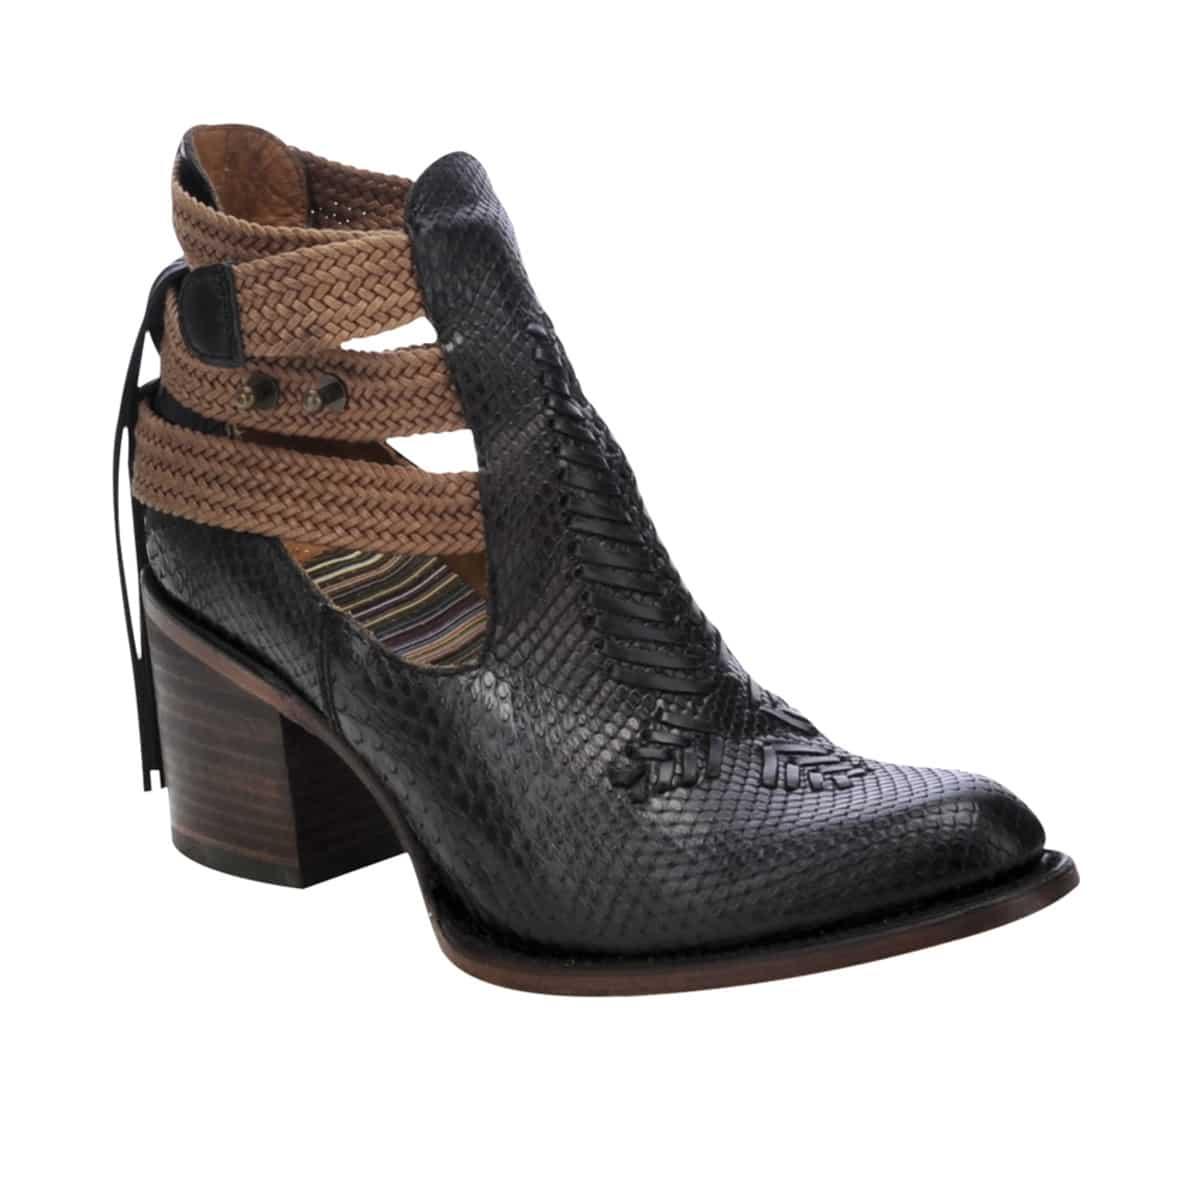 Fashion over 50   Summer Boots   Black Python Braided Shortie